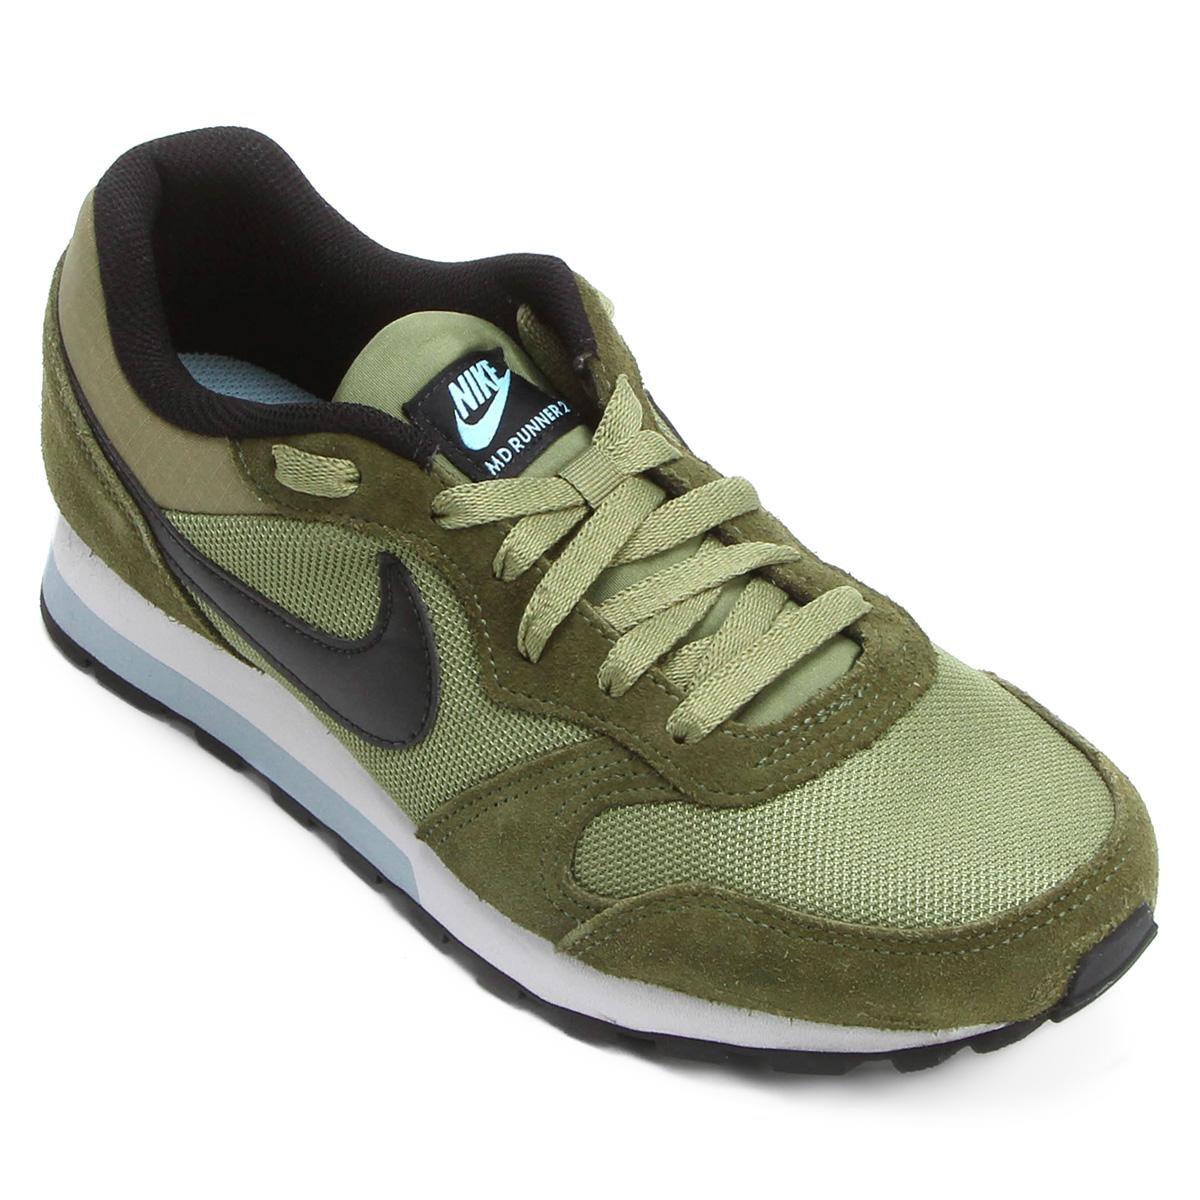 86ccf15c6bc48 Tênis Nike Md Runner 2 Masculino - Verde e Preto - Compre Agora ...